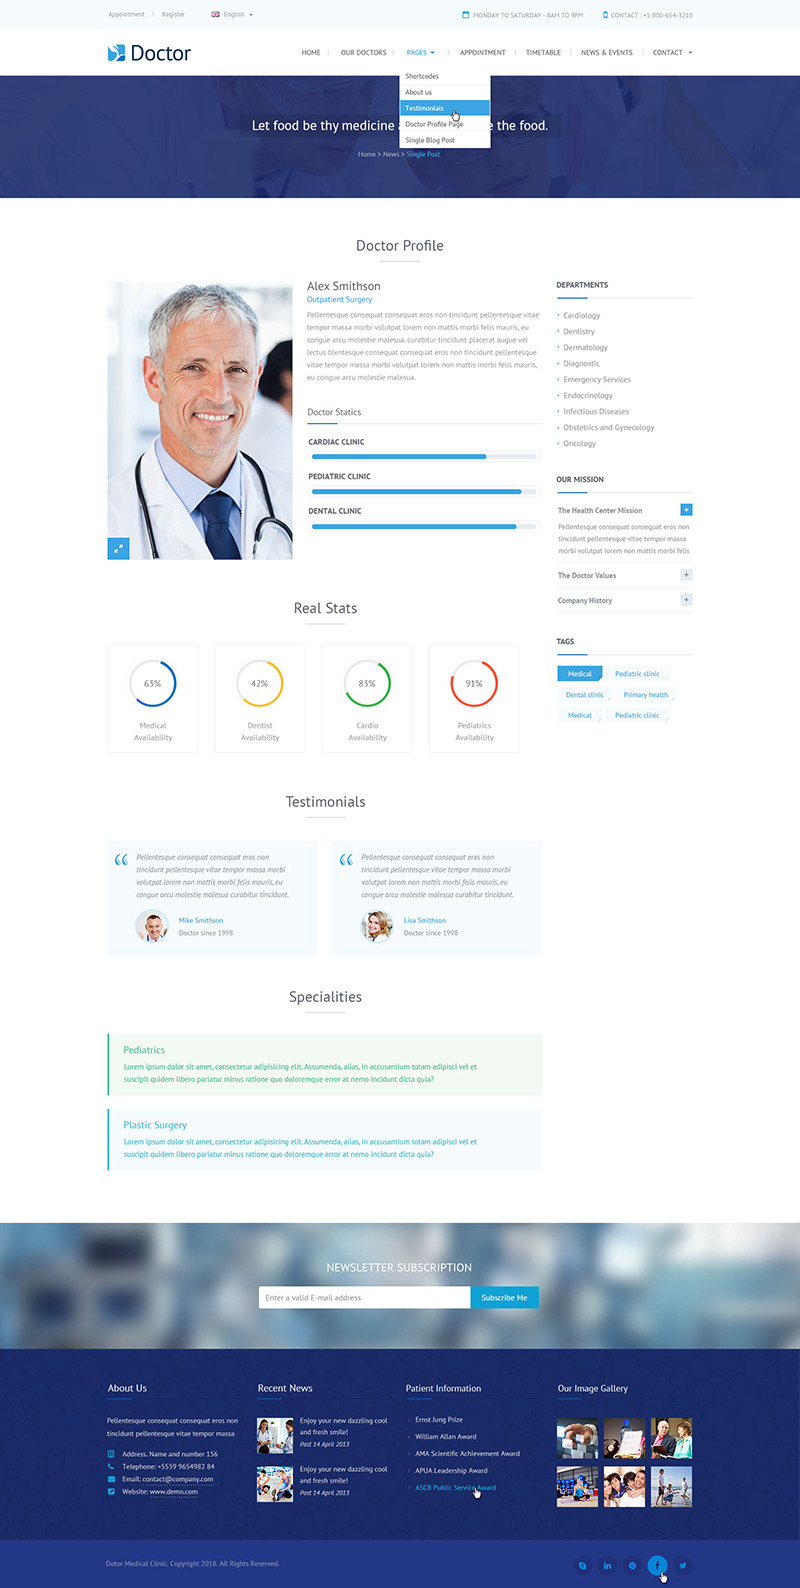 Doctor - Health Clinical PSD Template by mustachethemes | ThemeForest